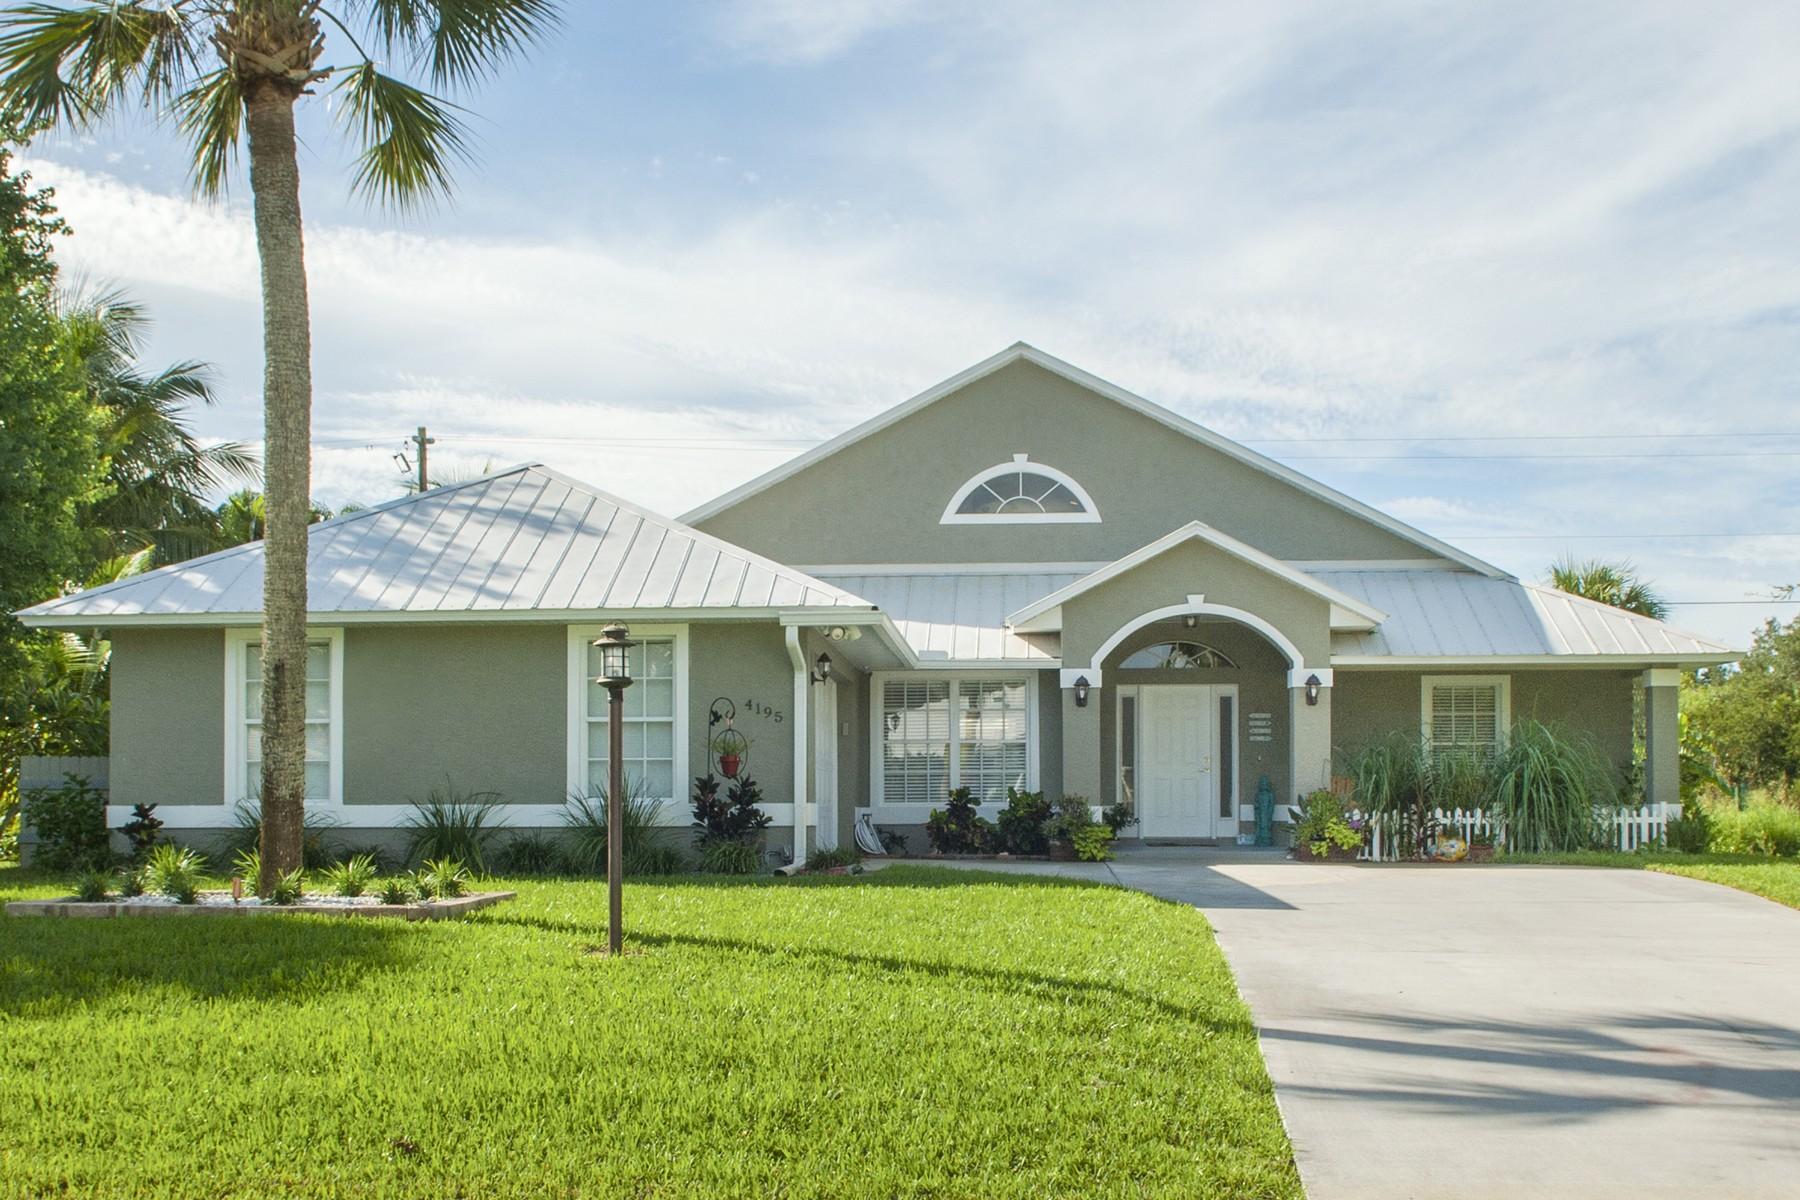 Single Family Home for Sale at Elegant Designer Showplace! 4195 79th Street Vero Beach, Florida, 32967 United States